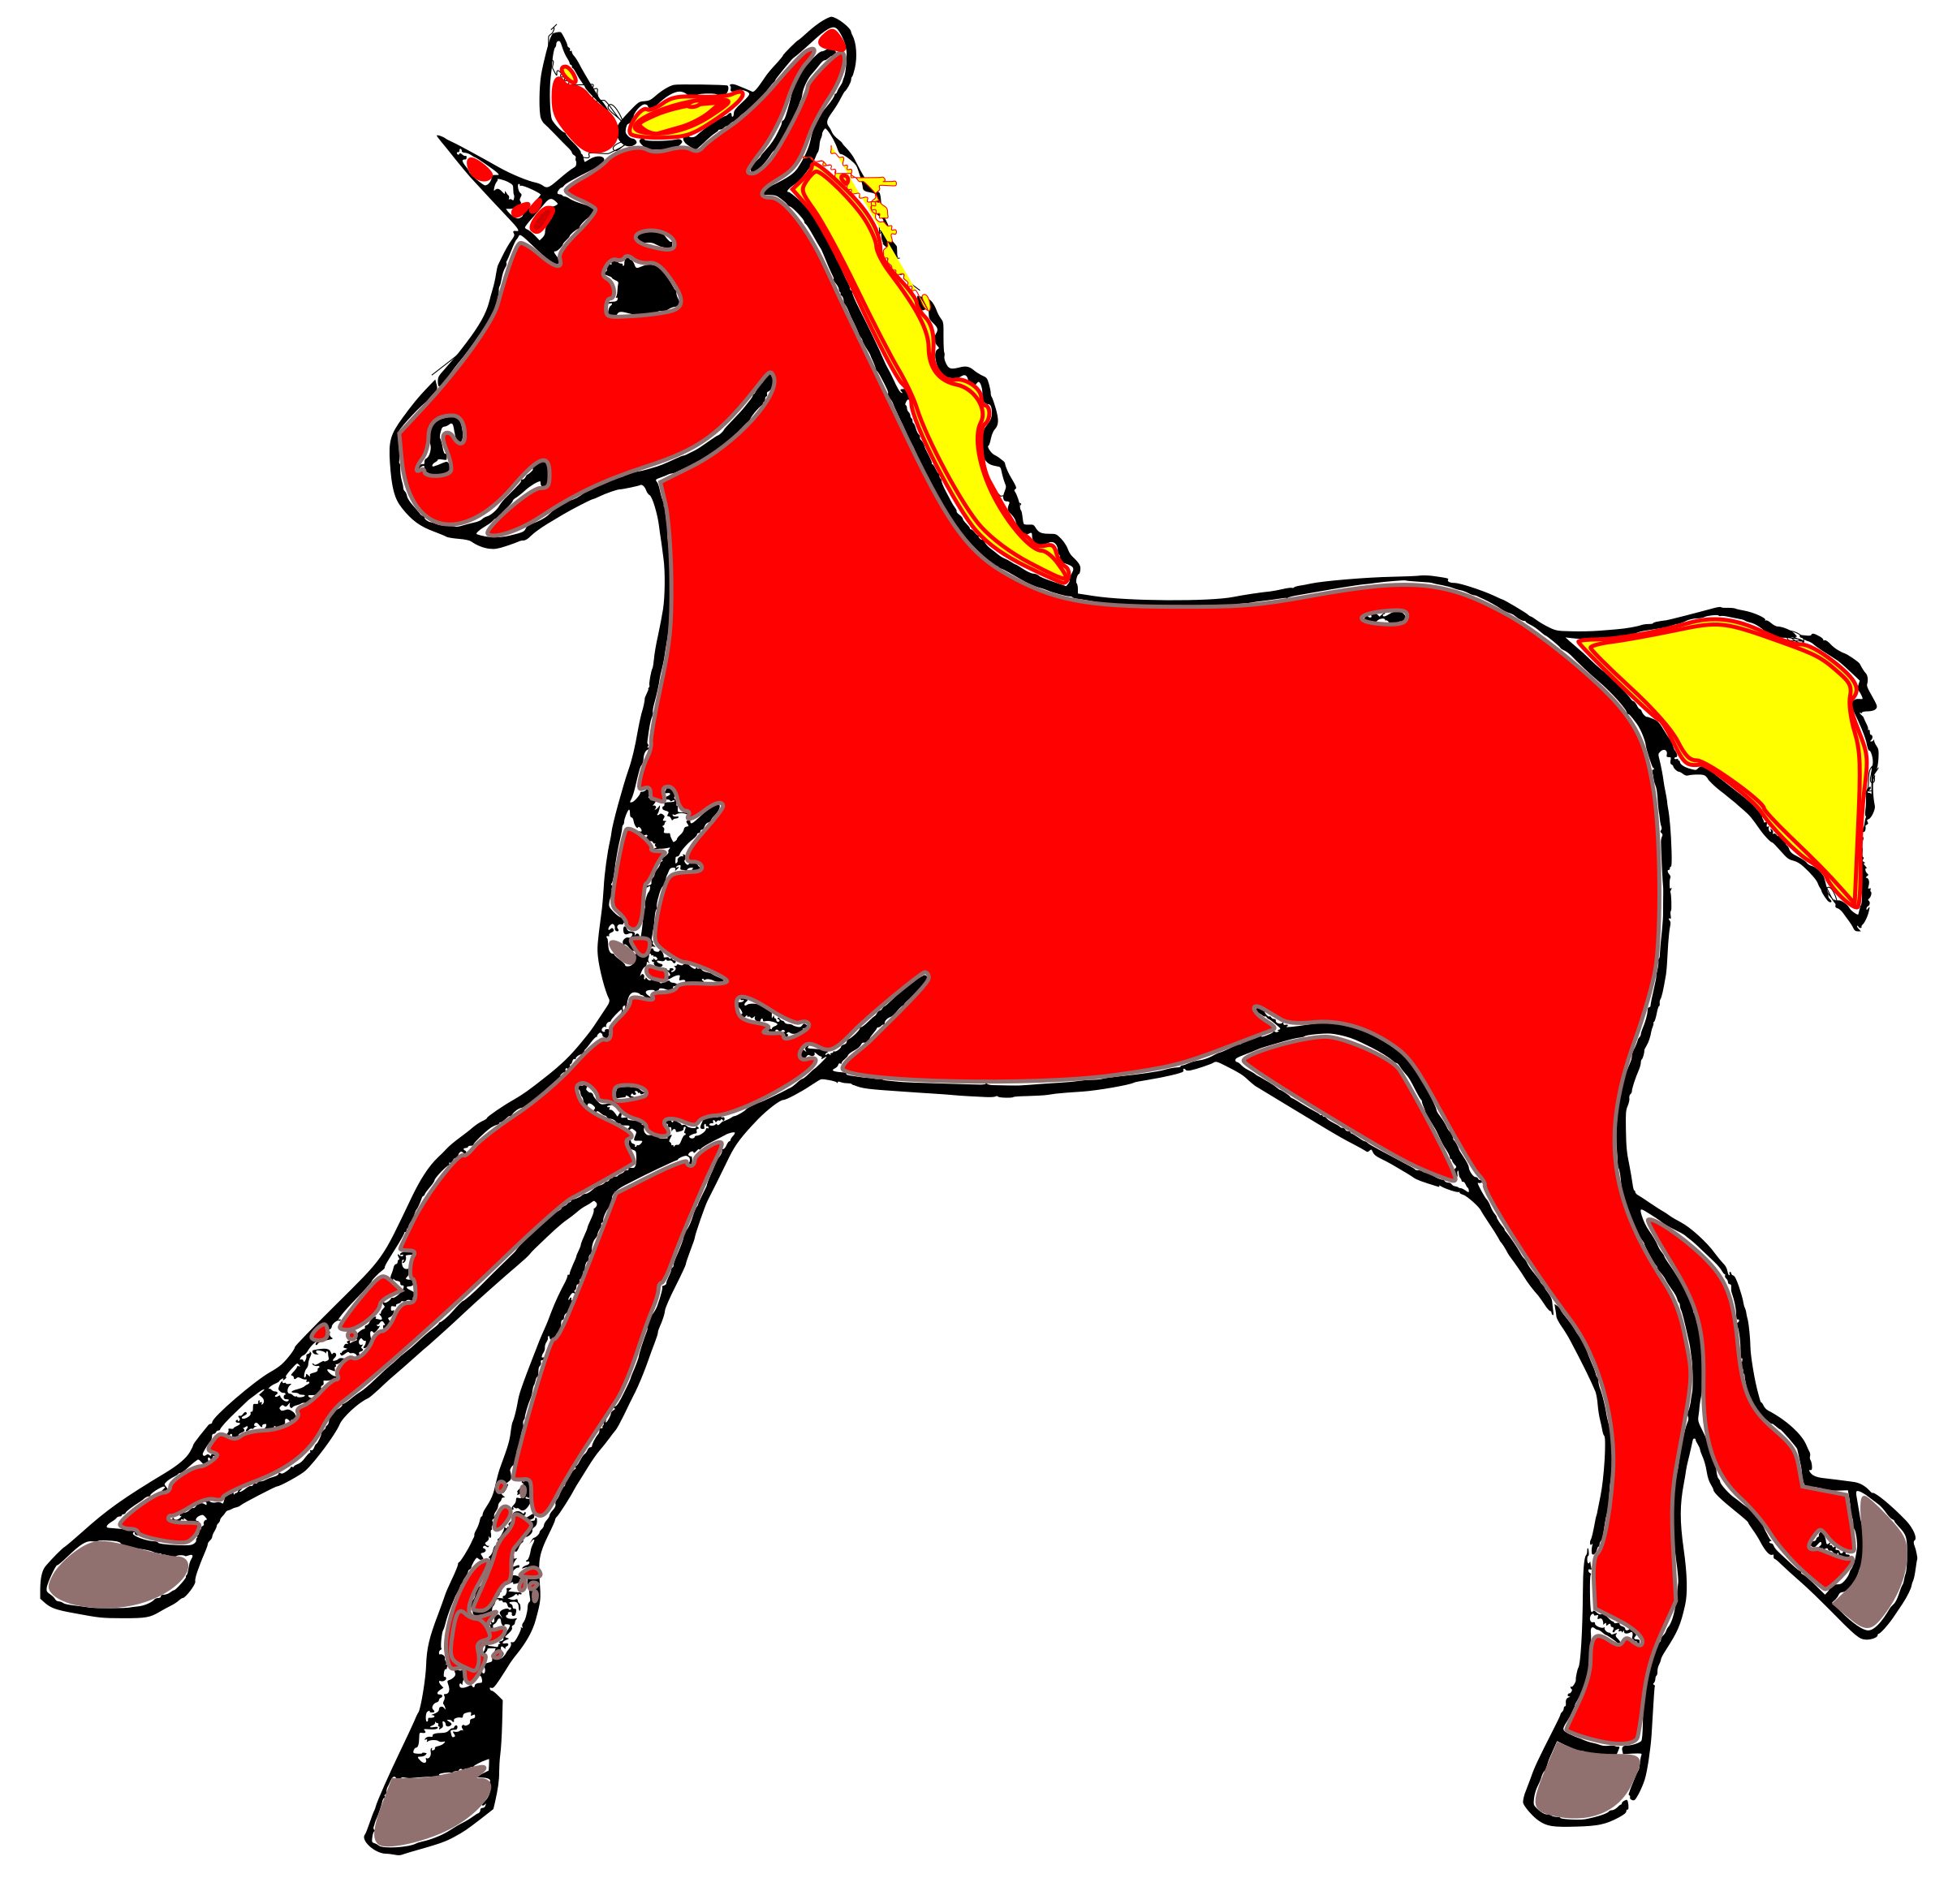 Clipart fire horse. Firehorse foal big image